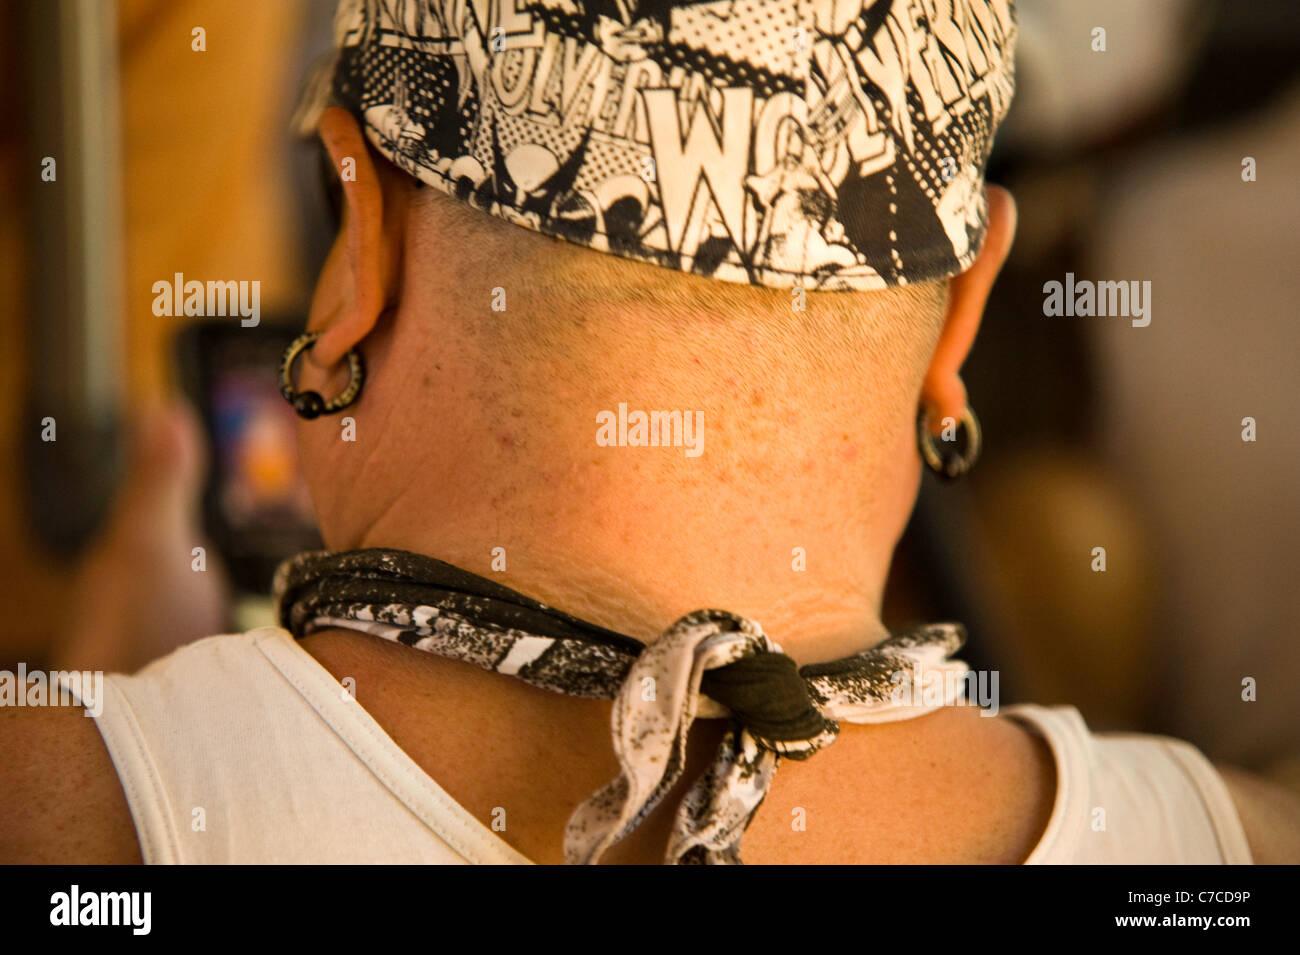 Man's Neck with black foulard, Arizona USA Stock Photo